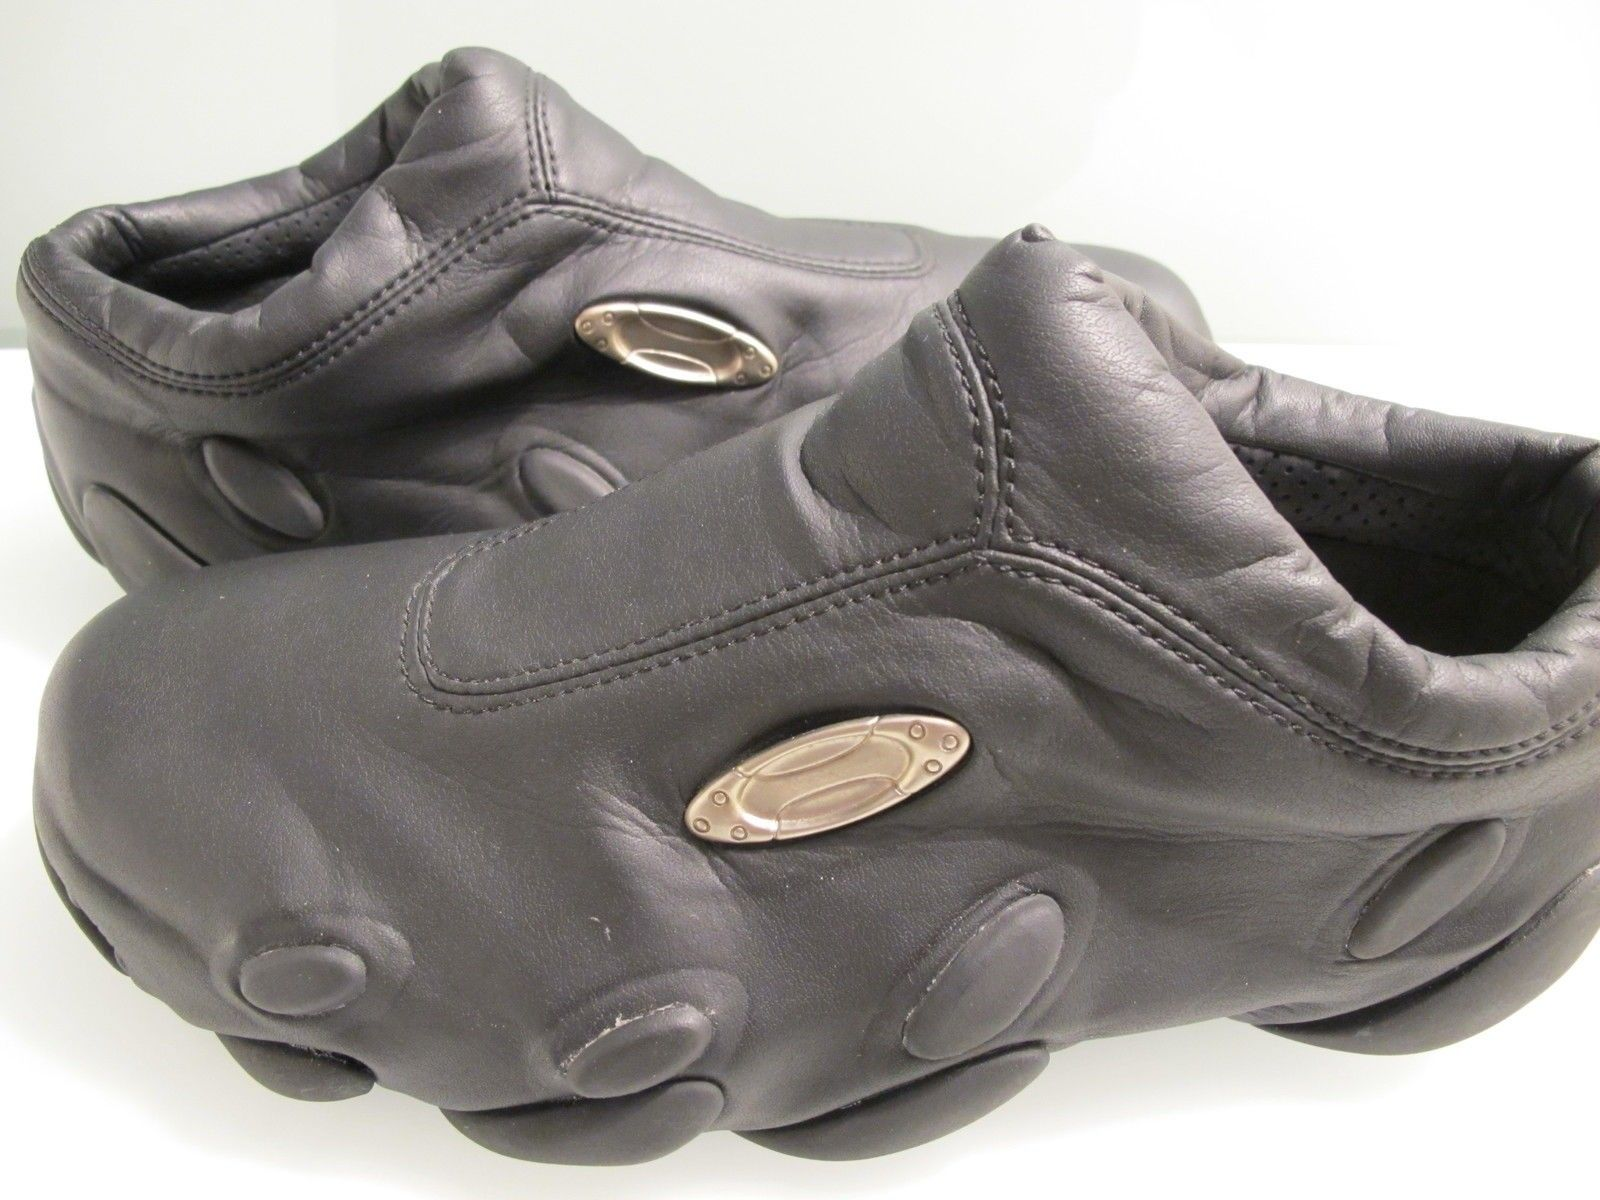 Arrowhead/ Flesh Prototype Shoes...anyone has any info on this? - $_57 (59).jpg